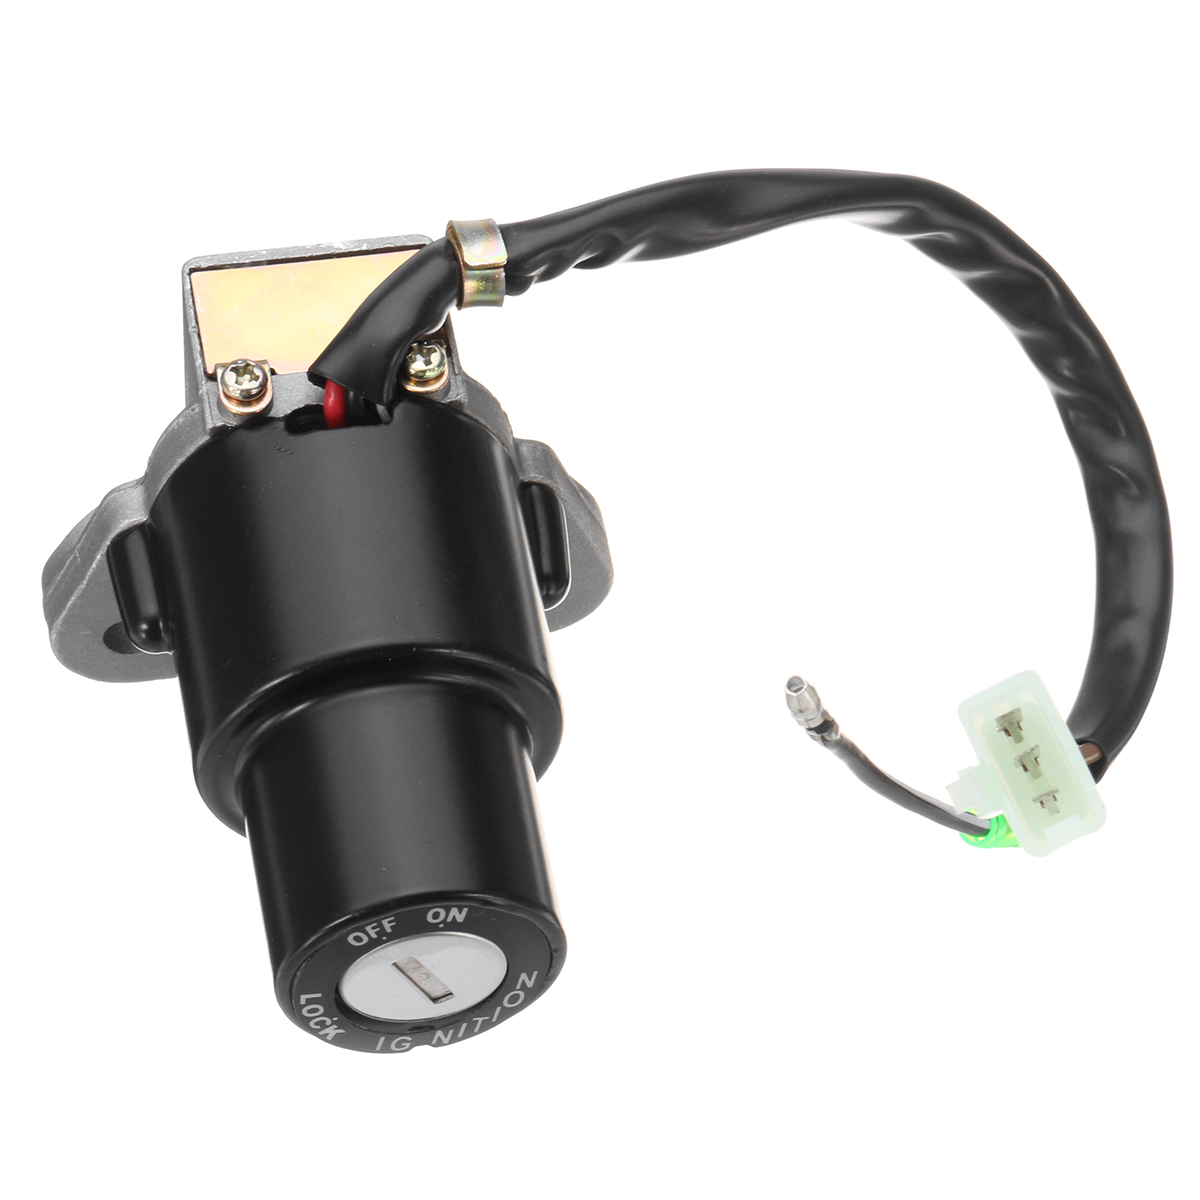 Ignition Switch Lock Assembly For Yamaha Xt250 Xt550 Xt600 1982 1989 Fzr400 Digital Control System 996d5d48 1784 40cf 9e38 8574b8615d0c